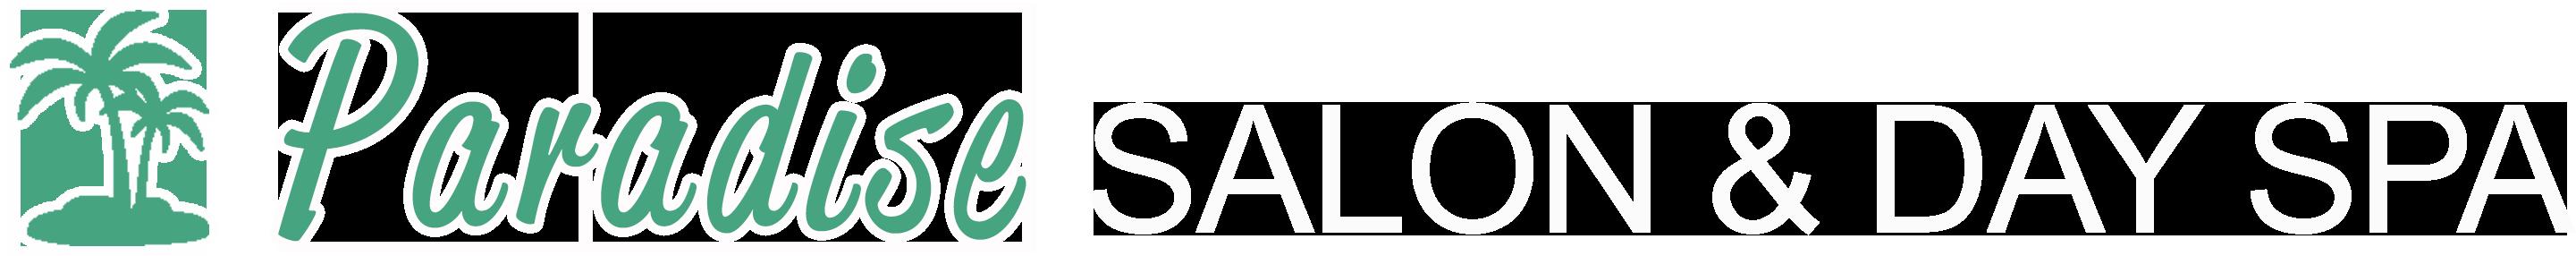 Paradise Salon & Day Spa